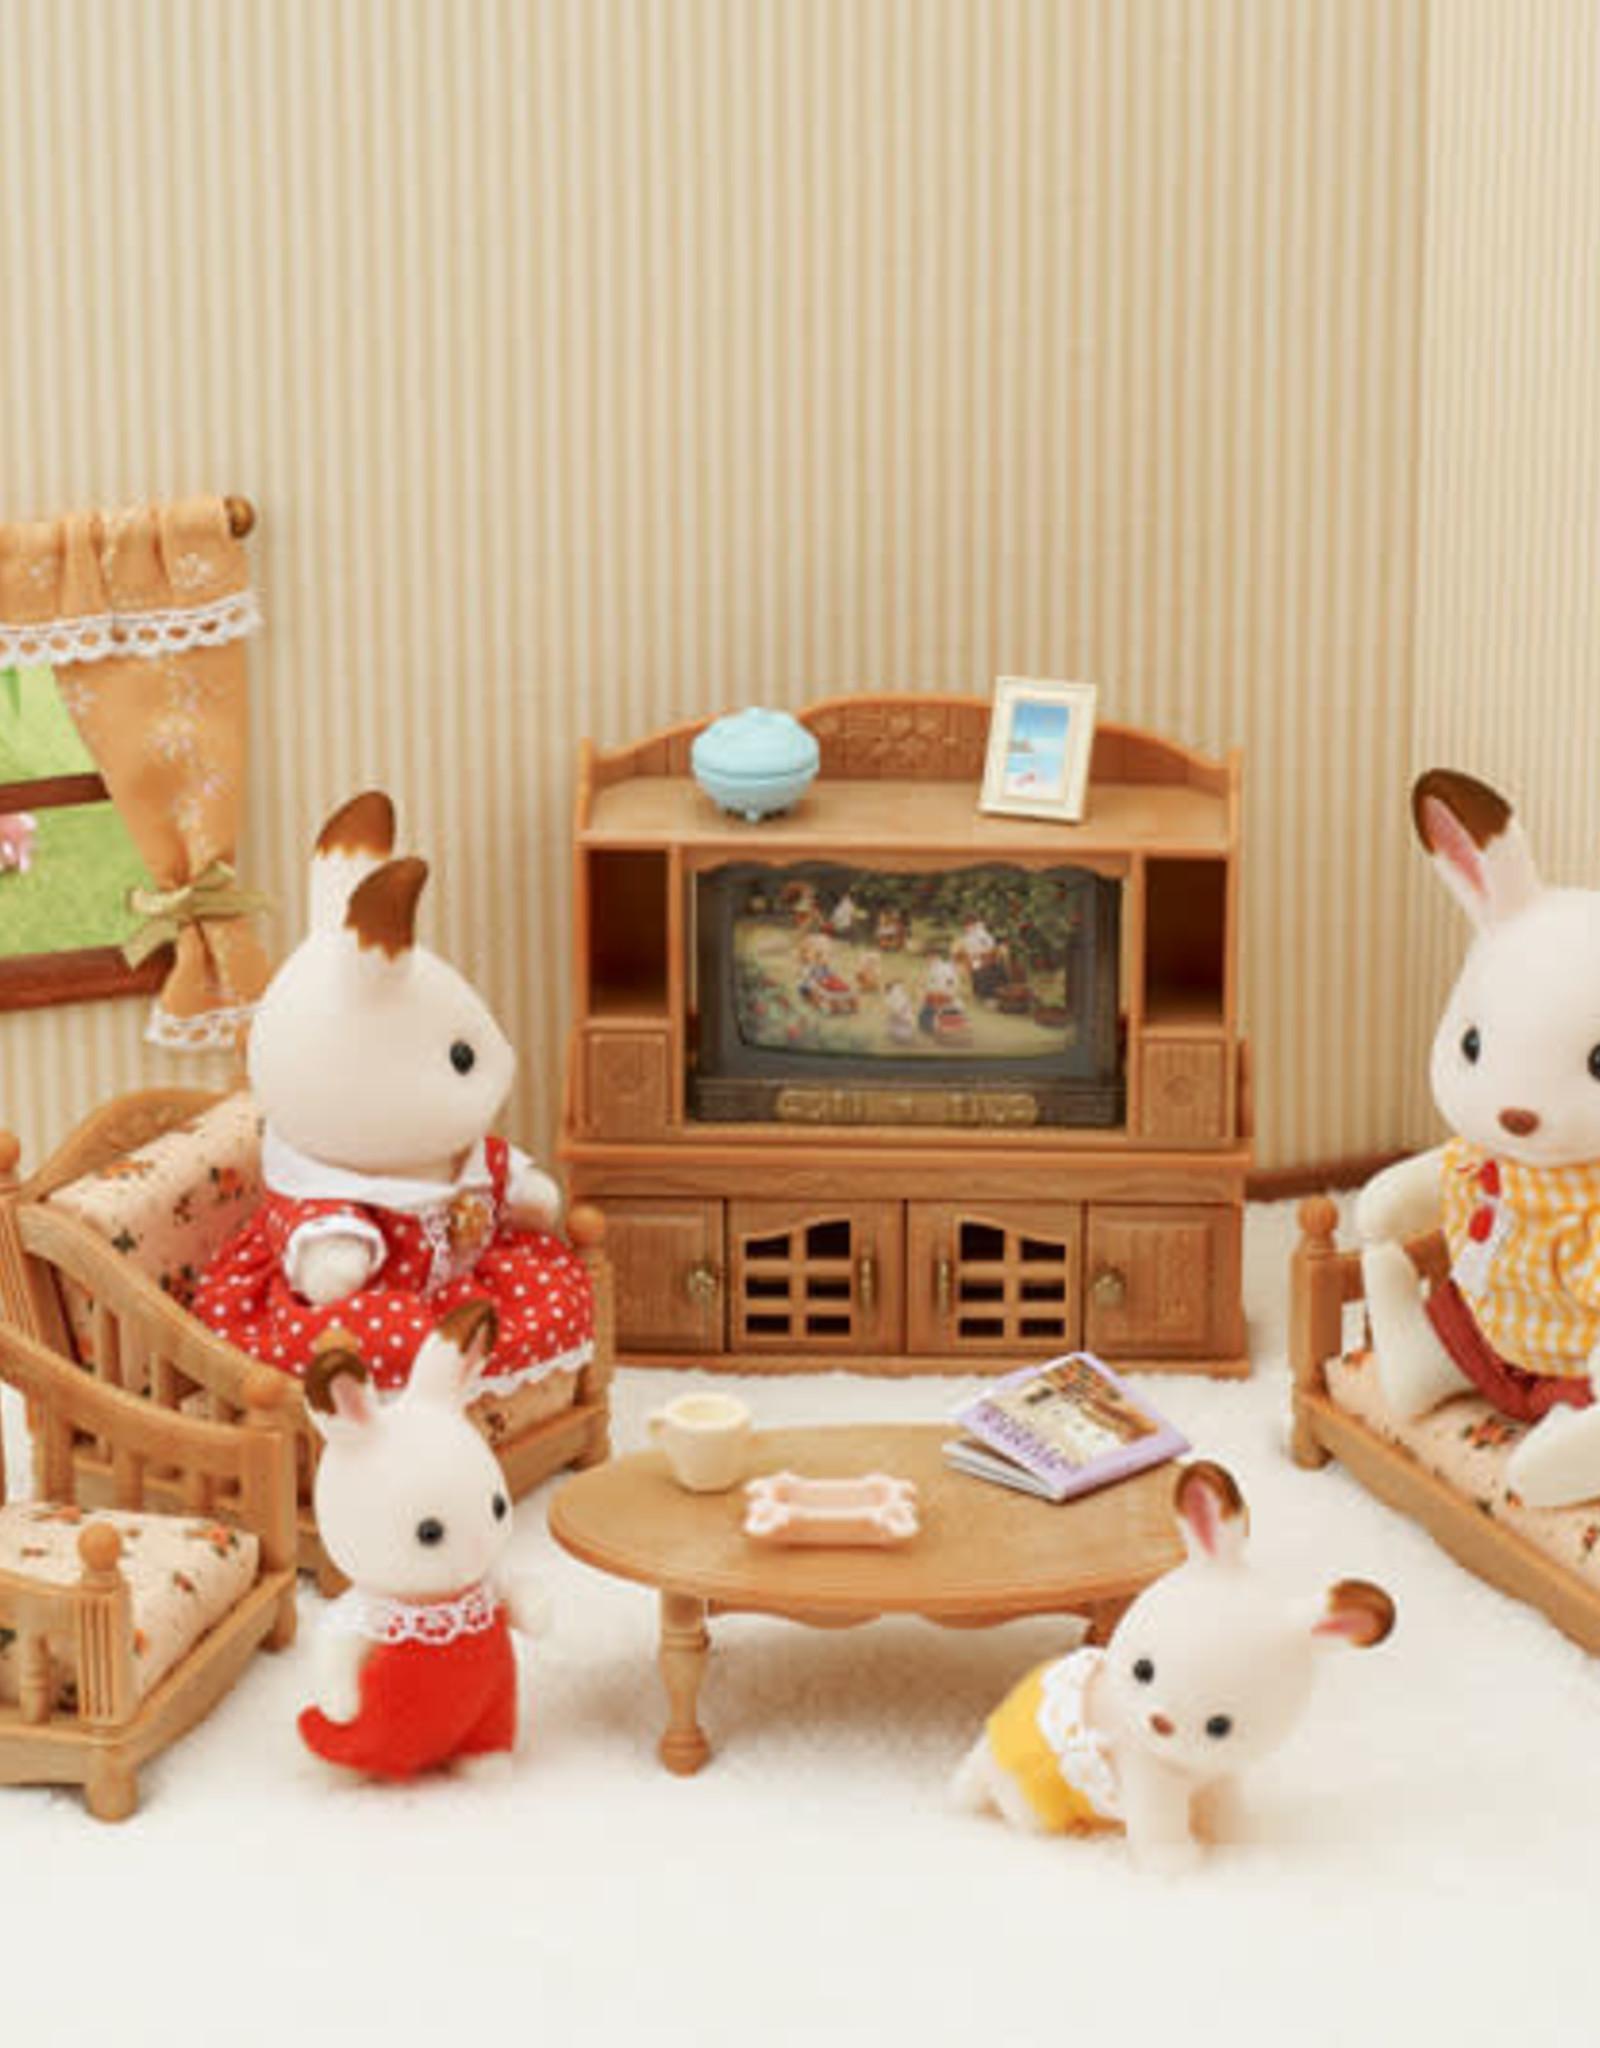 Calico Critters CC Comfy Living Room Set